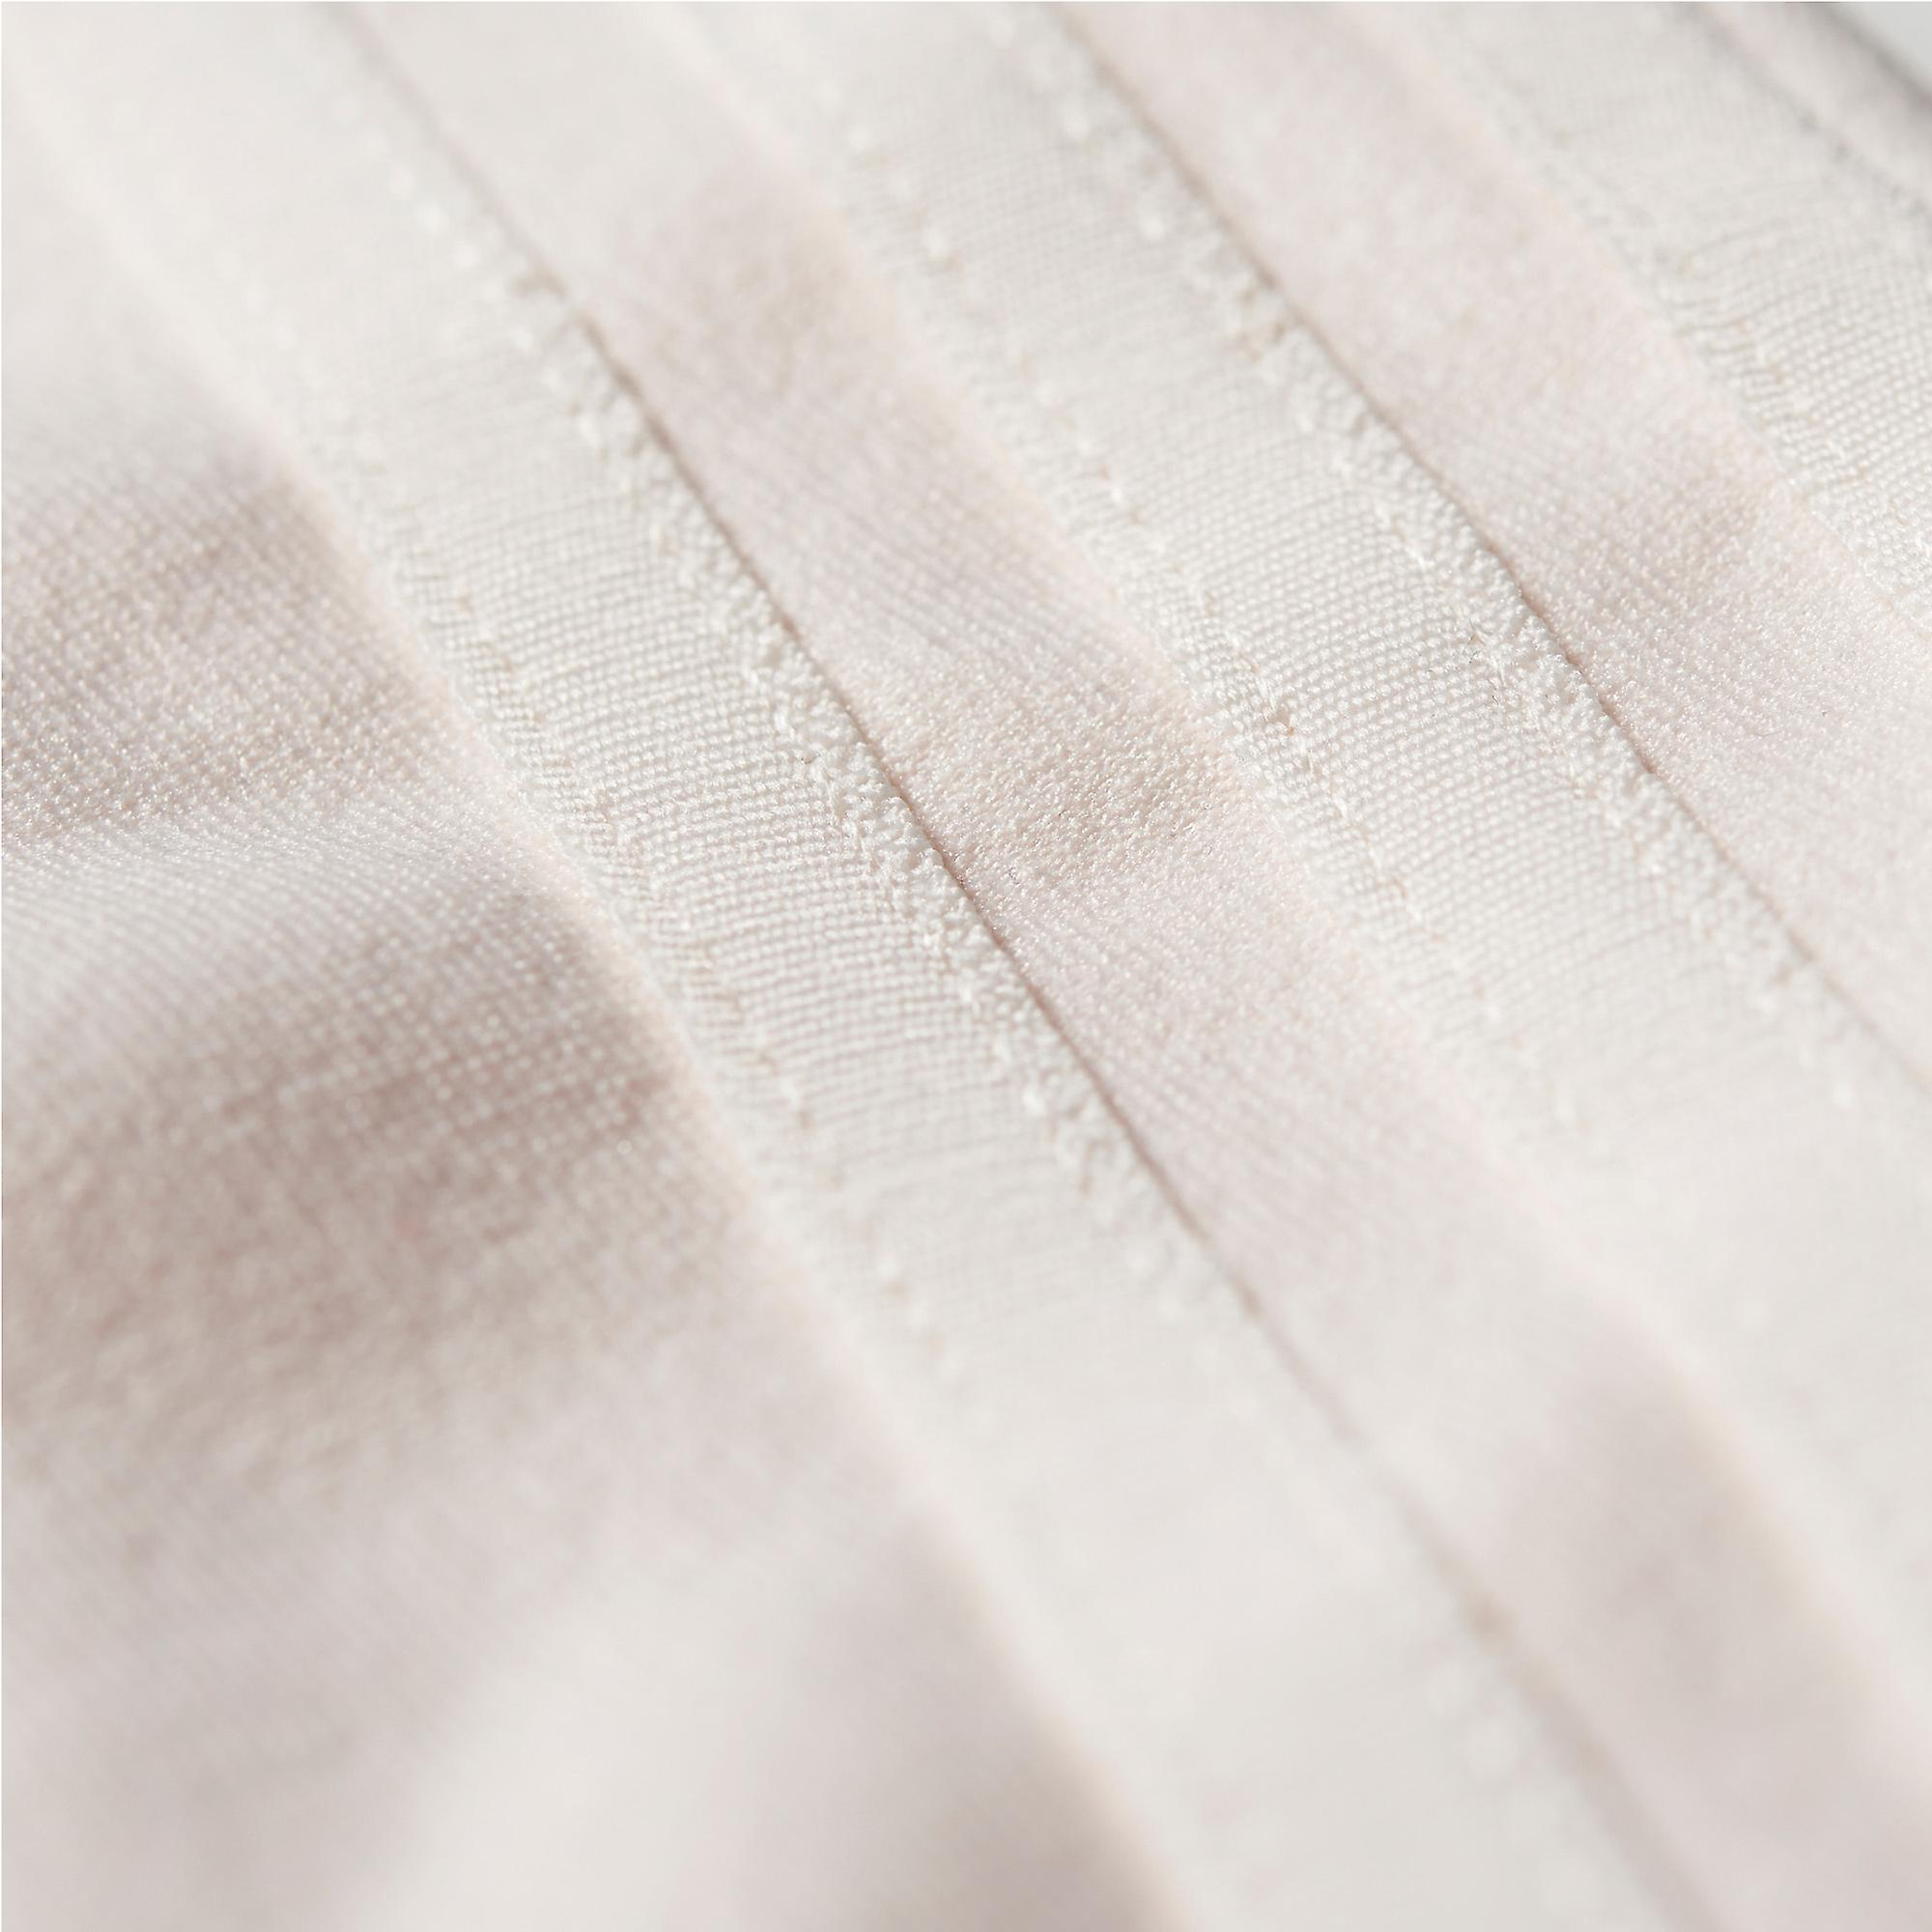 adidas Long Sleeve Mens Cricket Whites Sweater Sweatshirt Jumper White